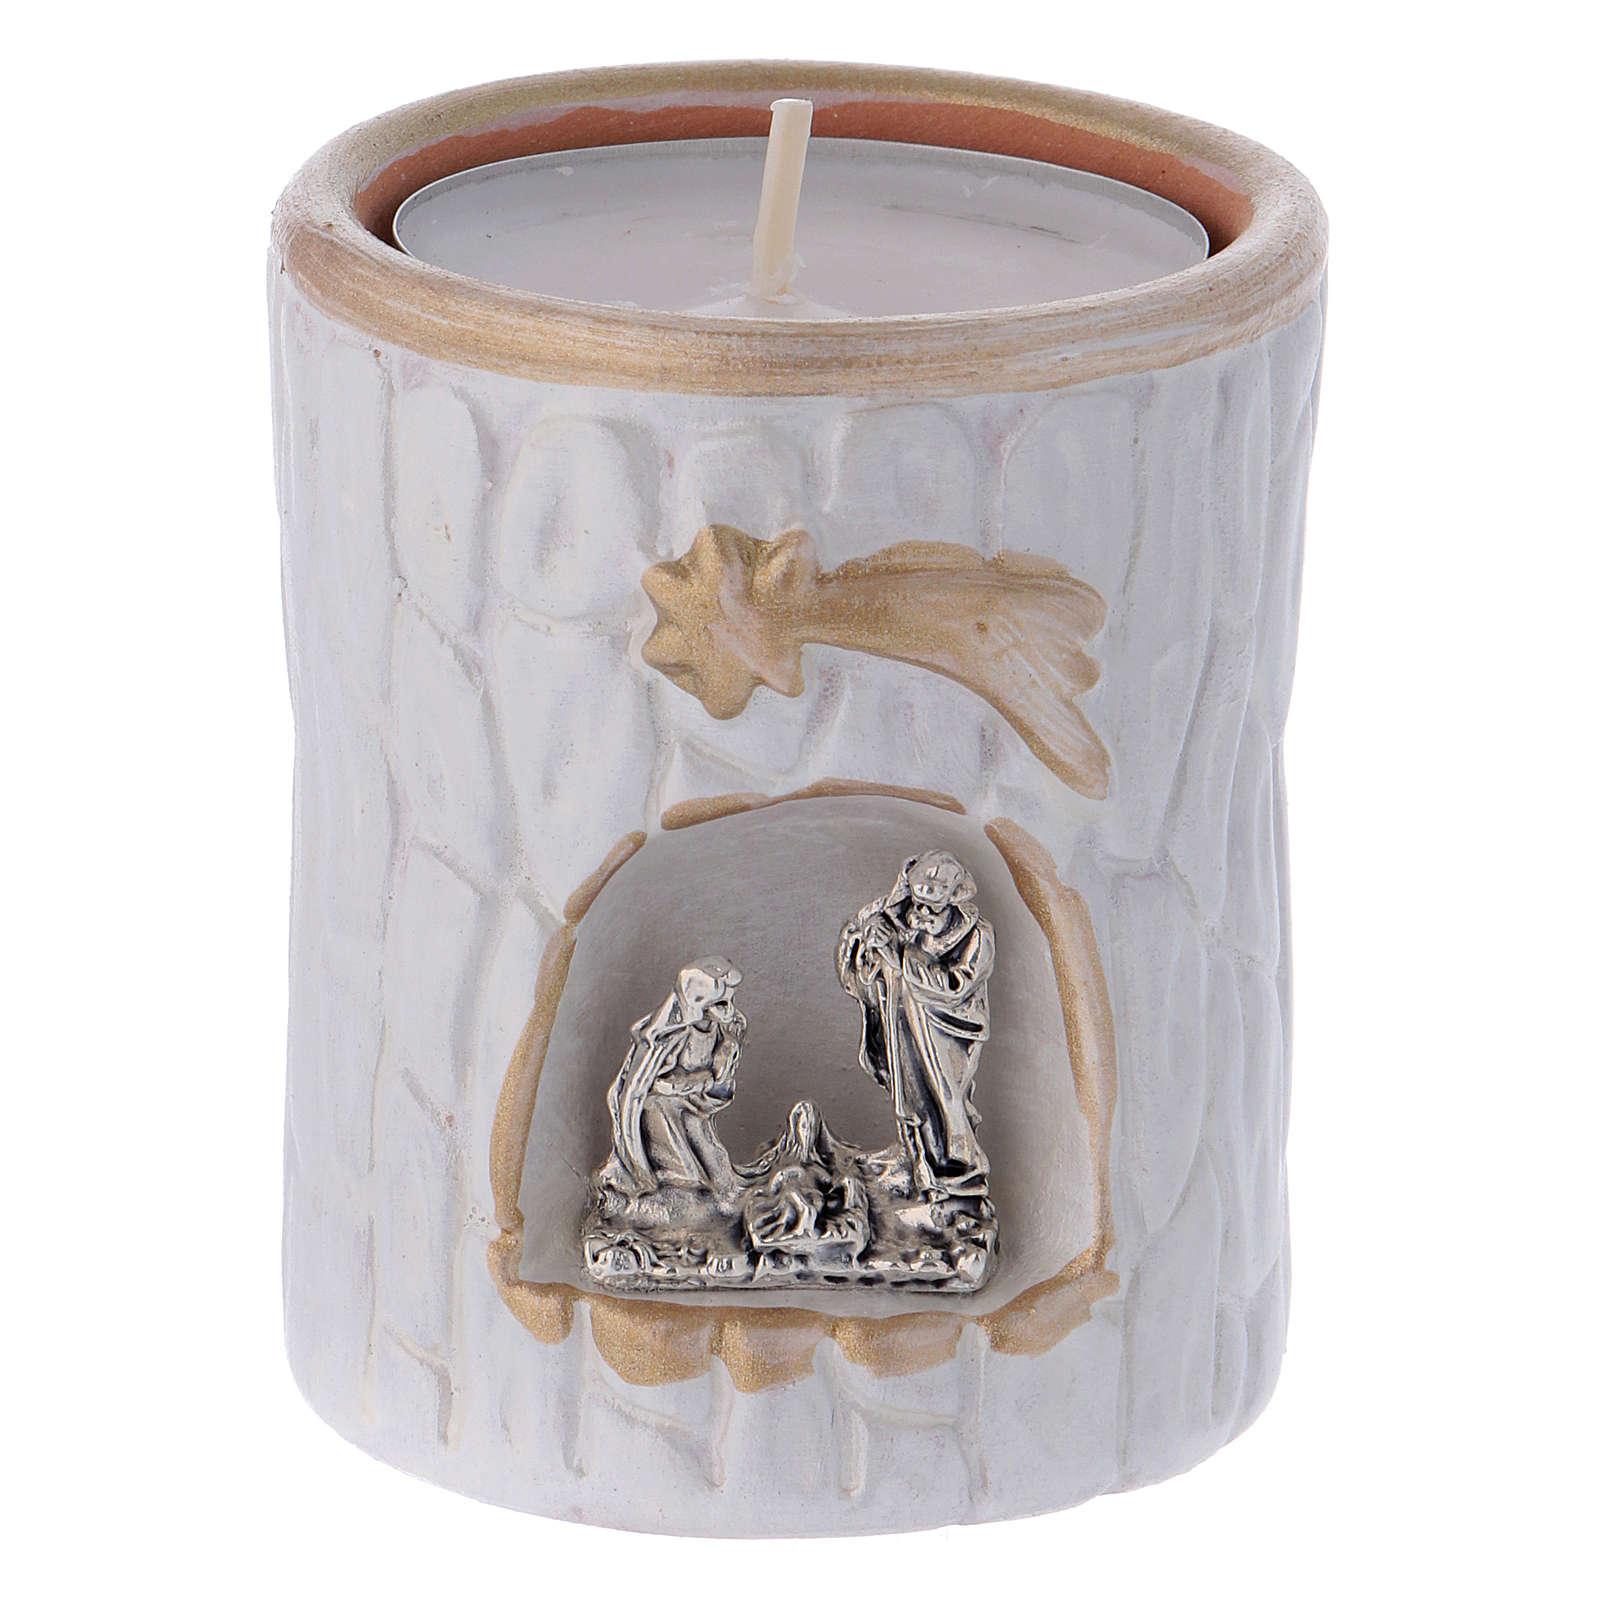 Portavela blanco detalles oro con Natividad terracota Deruta 3